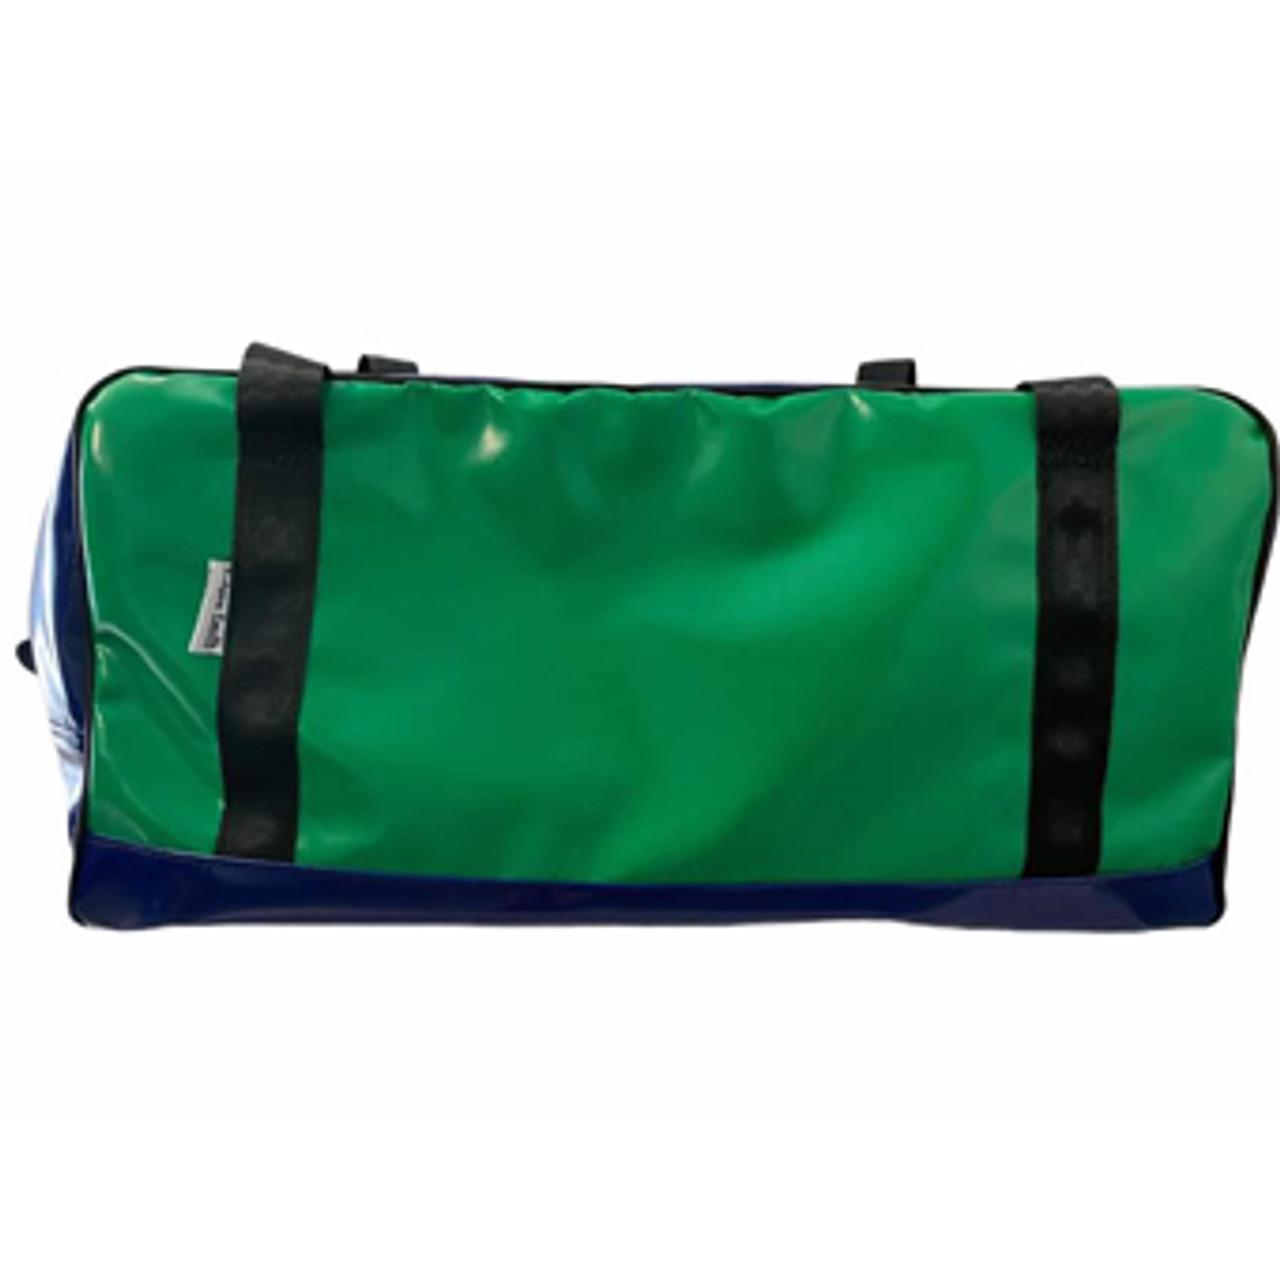 Travel Mate Bag  Australian Made 52cmL X 28cmW X 25cm H